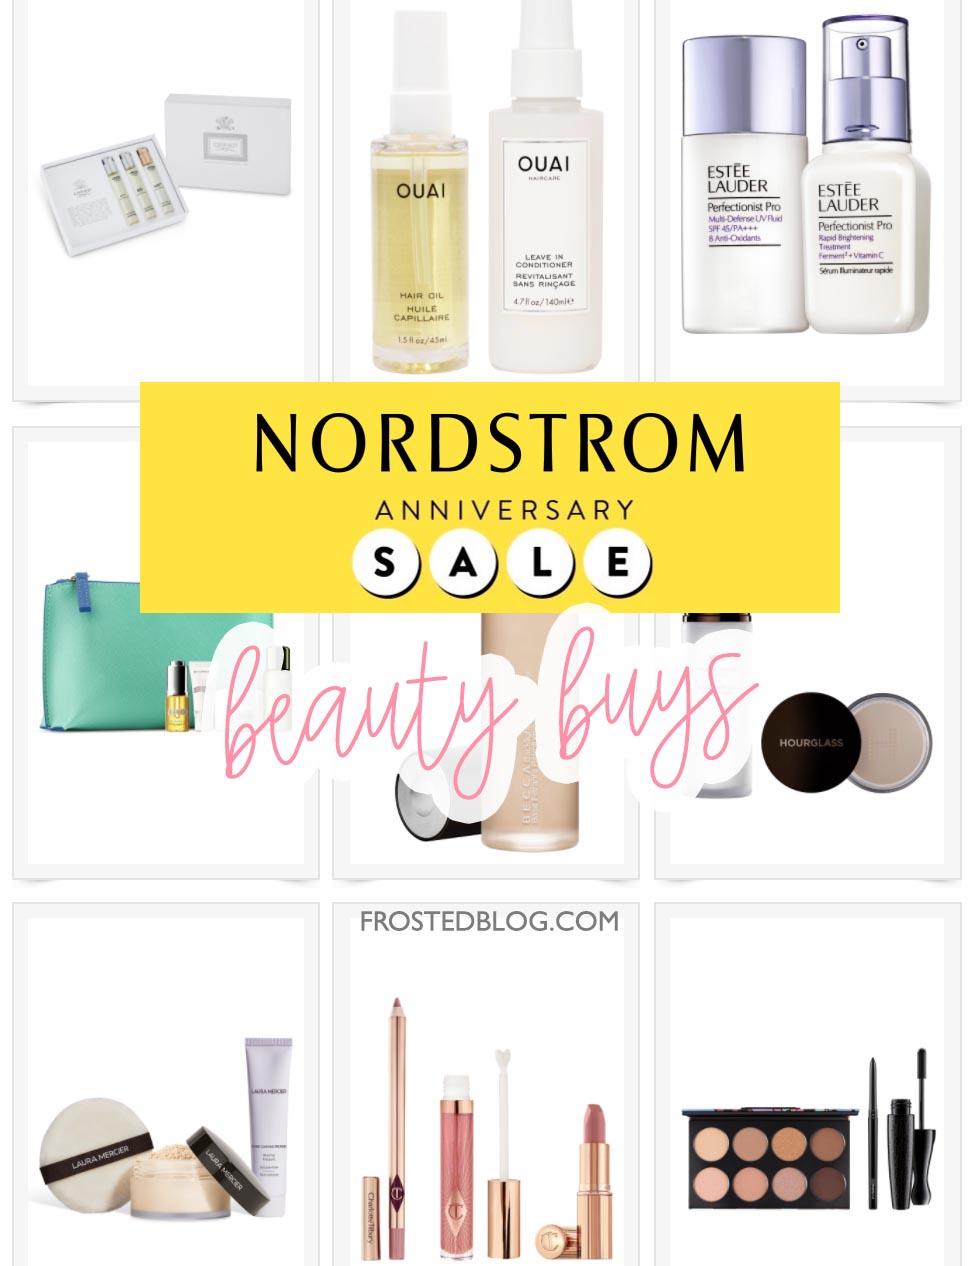 2020 Nordstrom Sale- Influencer Favorites Beauty, Hair, Makeup